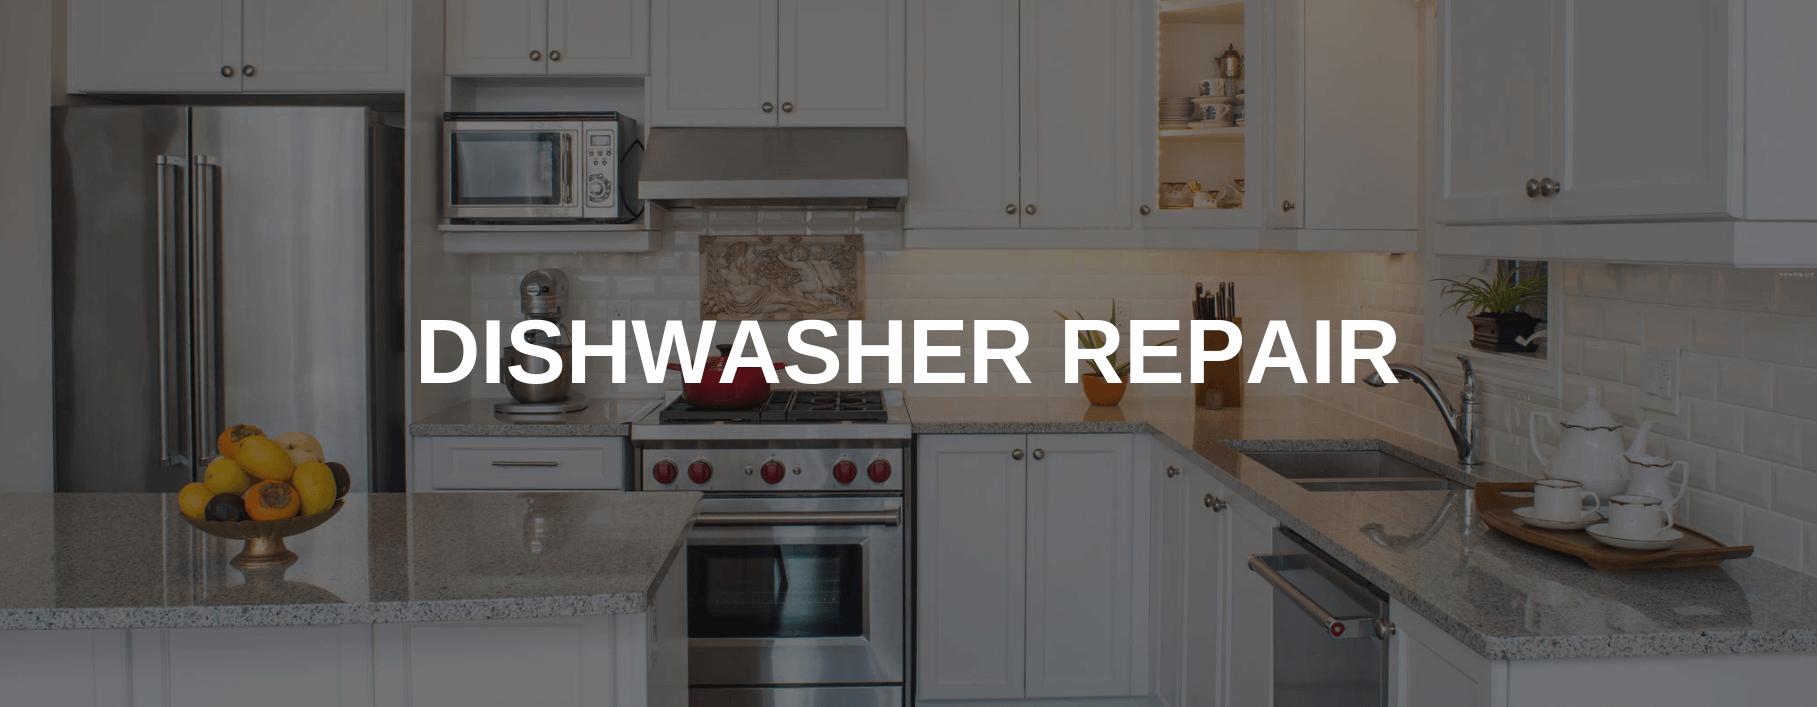 dishwasher repair new milford